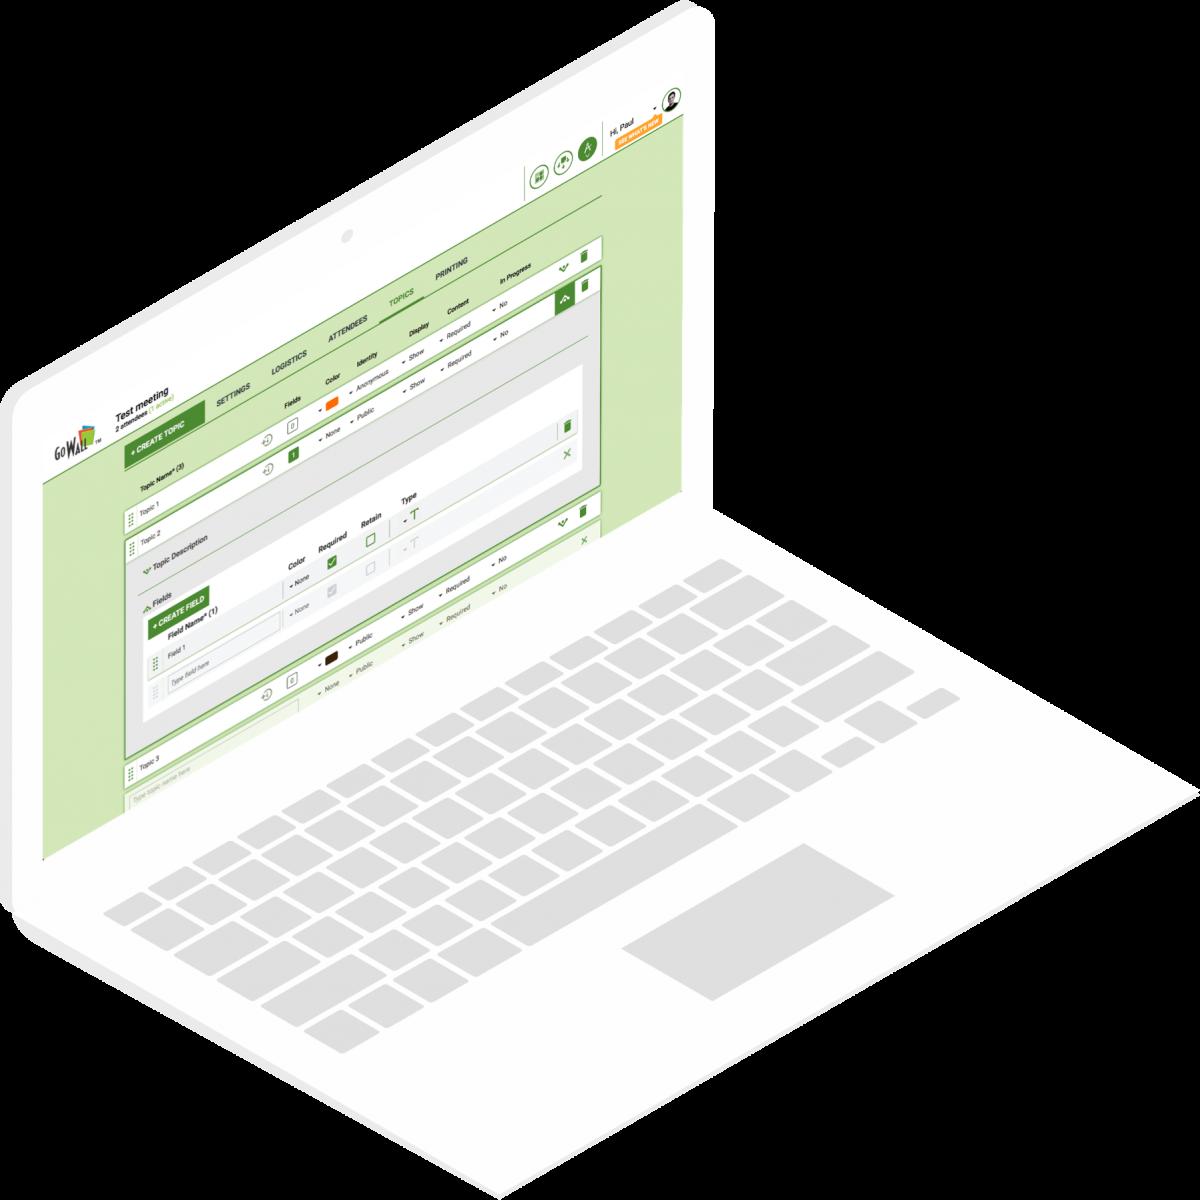 gowall-laptop